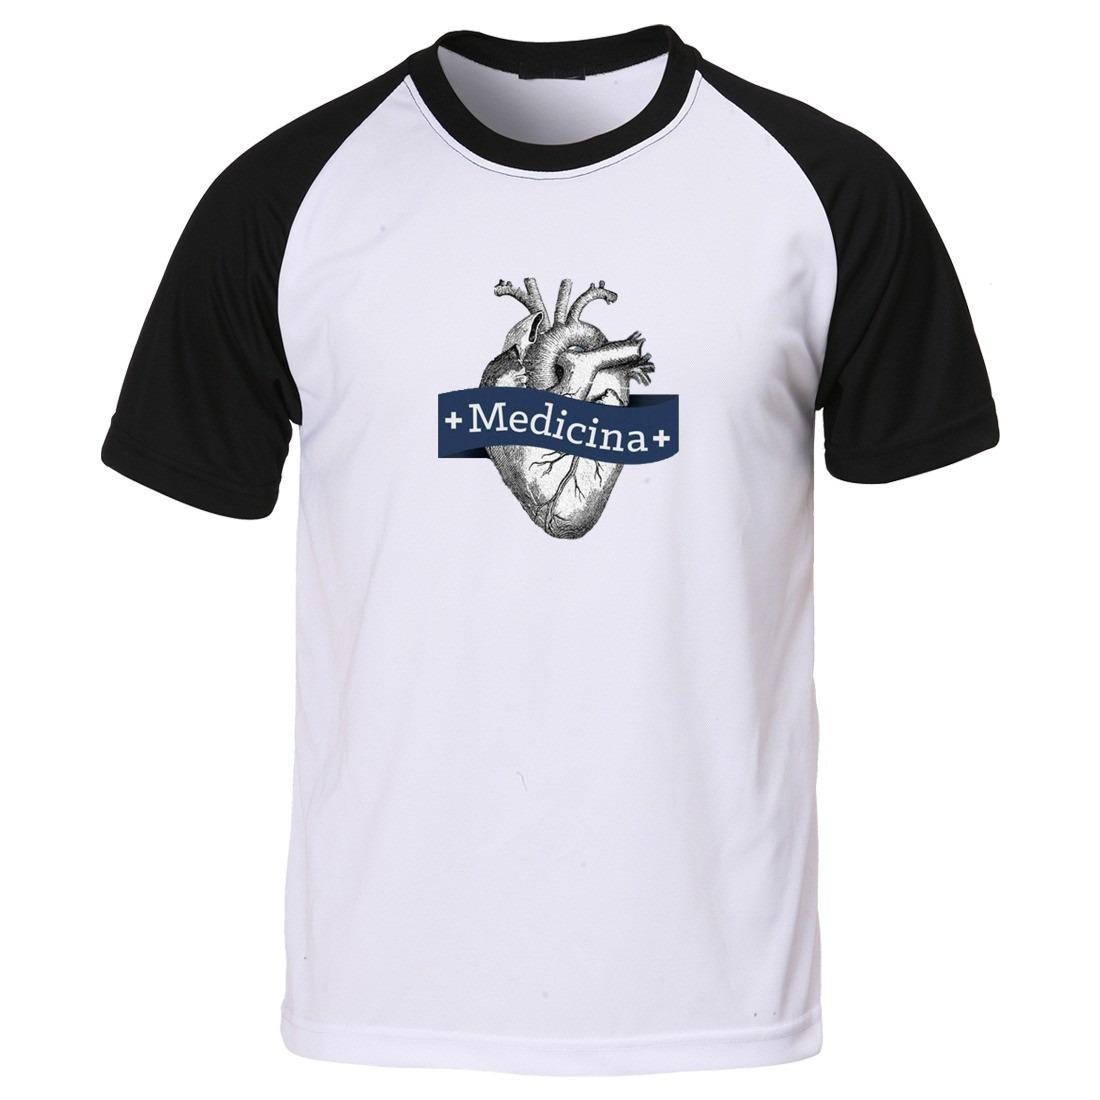 Camisetas medicina formandos médico camisa formatura carregando zoom jpg  1100x1100 Camisetas de formandos 2018 59a1ec230d2